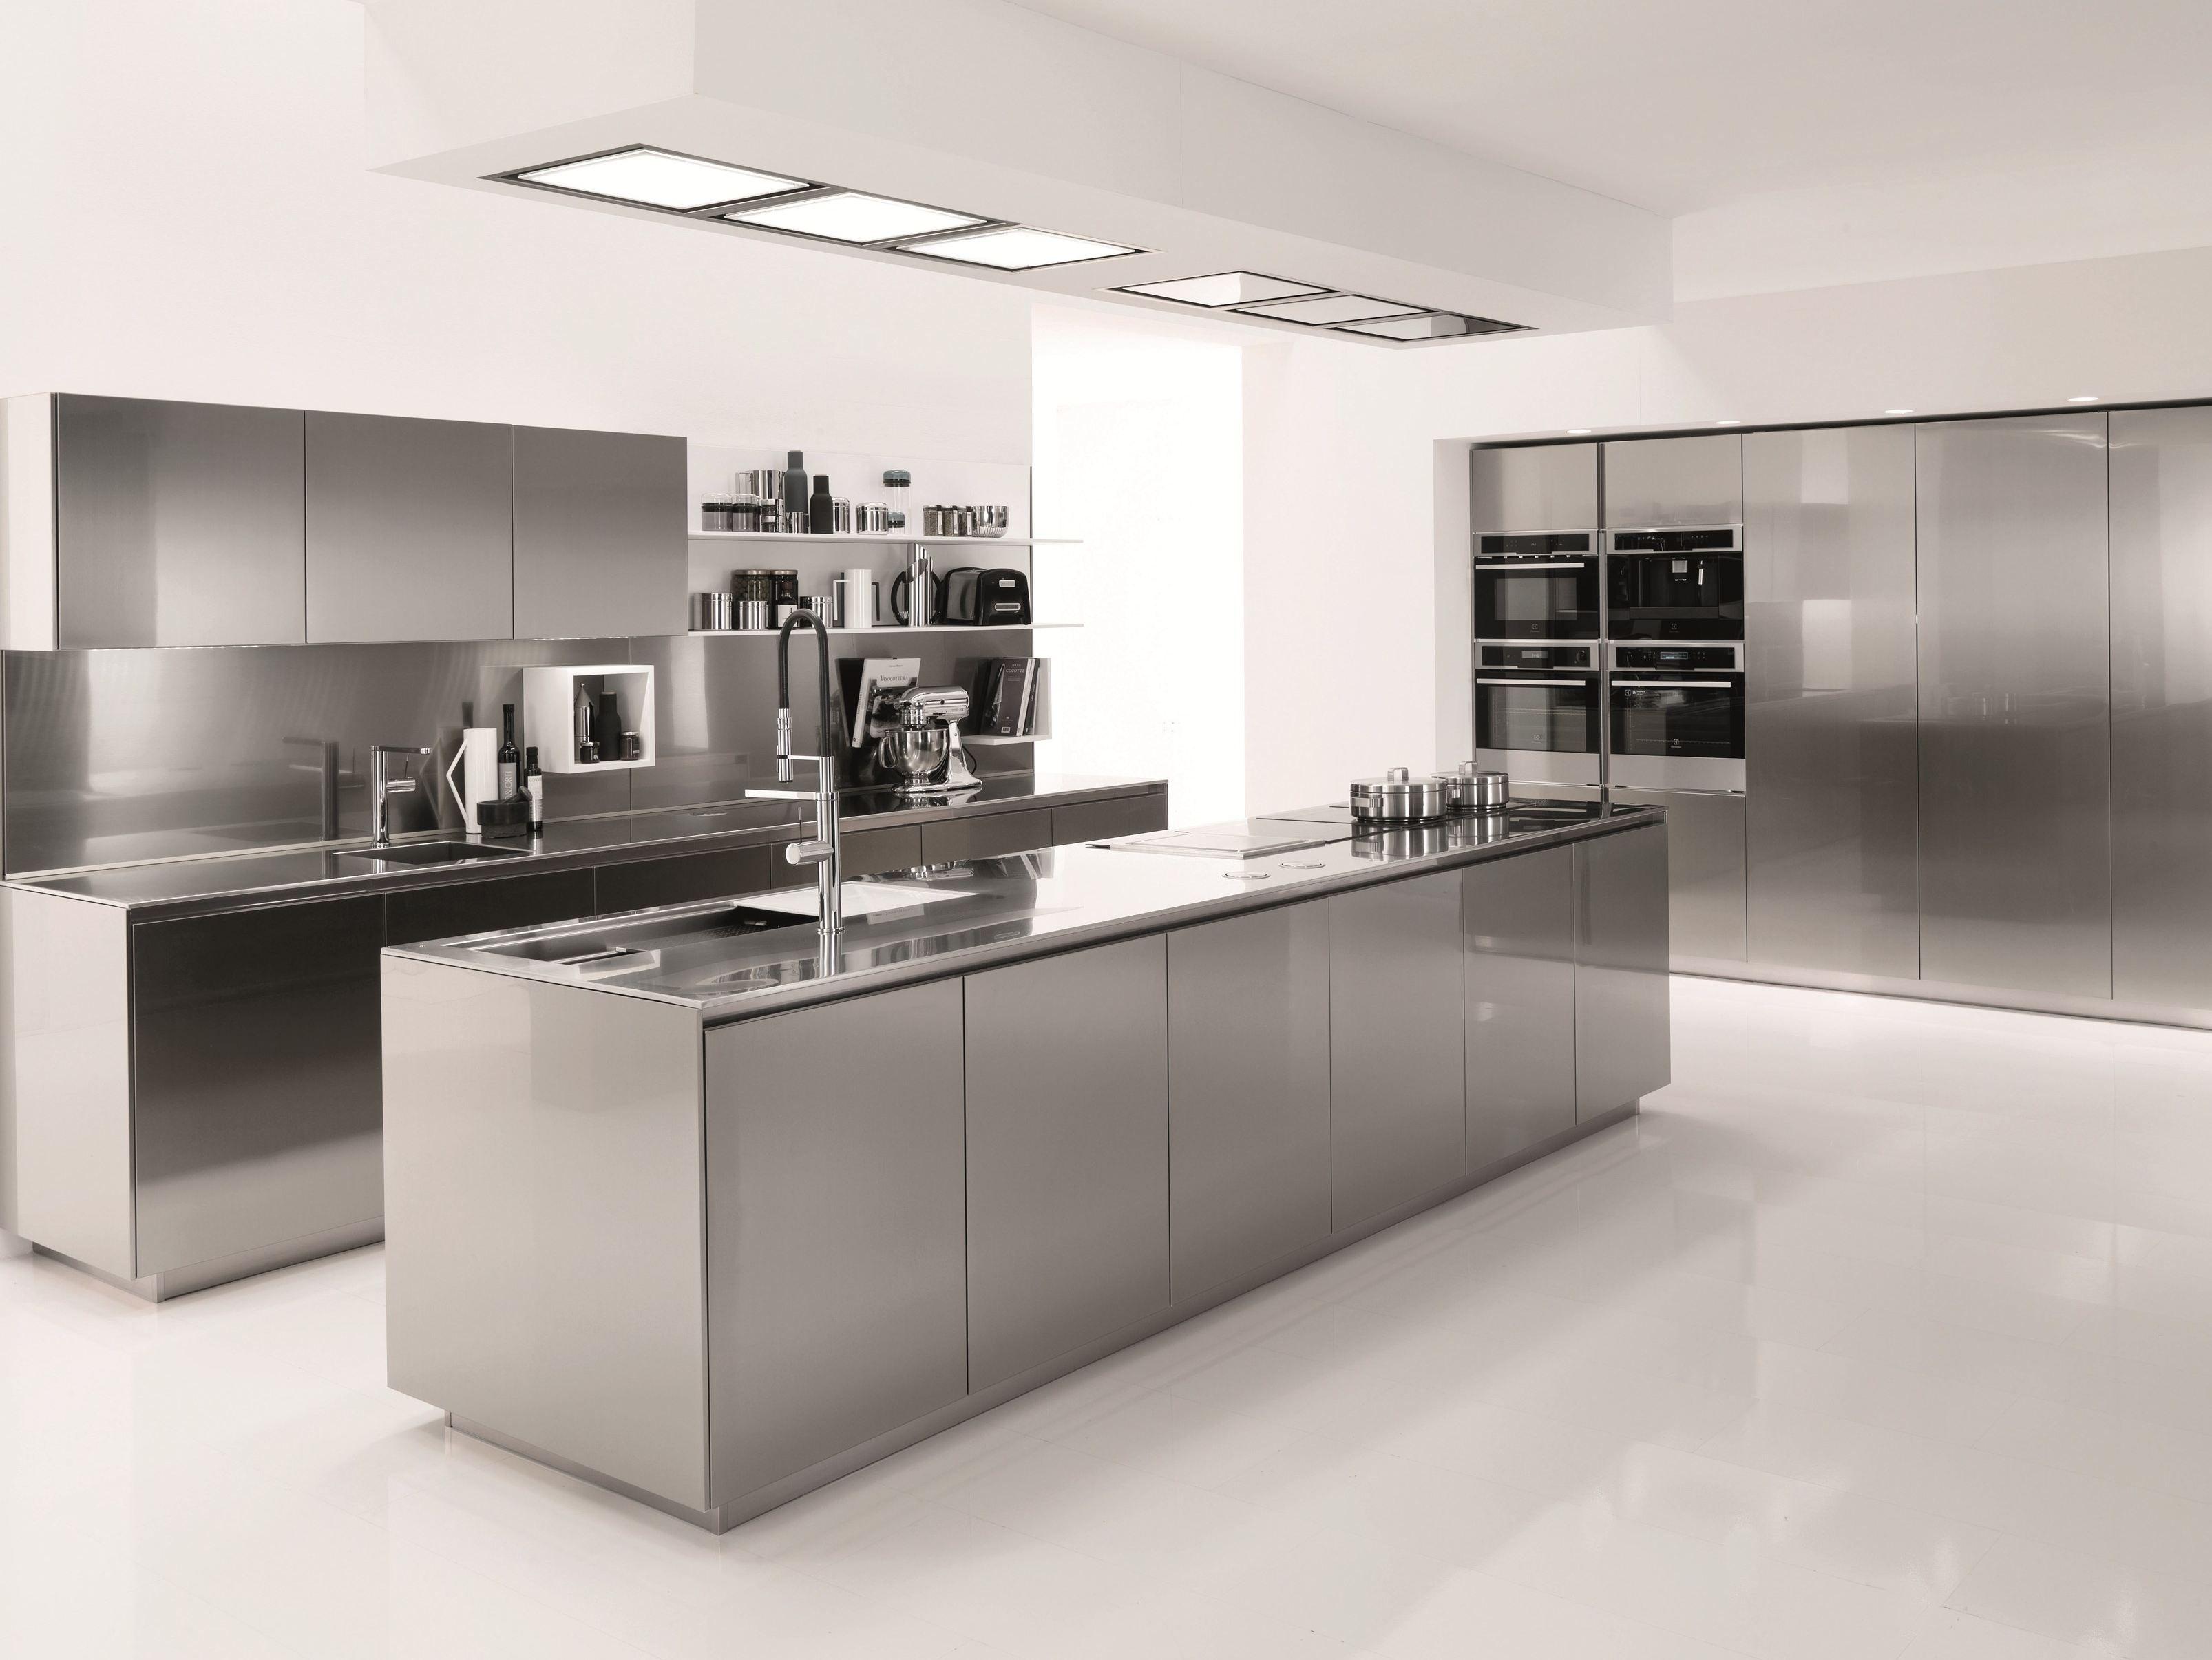 Kitchen Square Downlight Double Handle Kitchen Cabinet Stainless Steel M Modern Kitchen Design Replacing Kitchen Countertops Stainless Steel Kitchen Cabinets